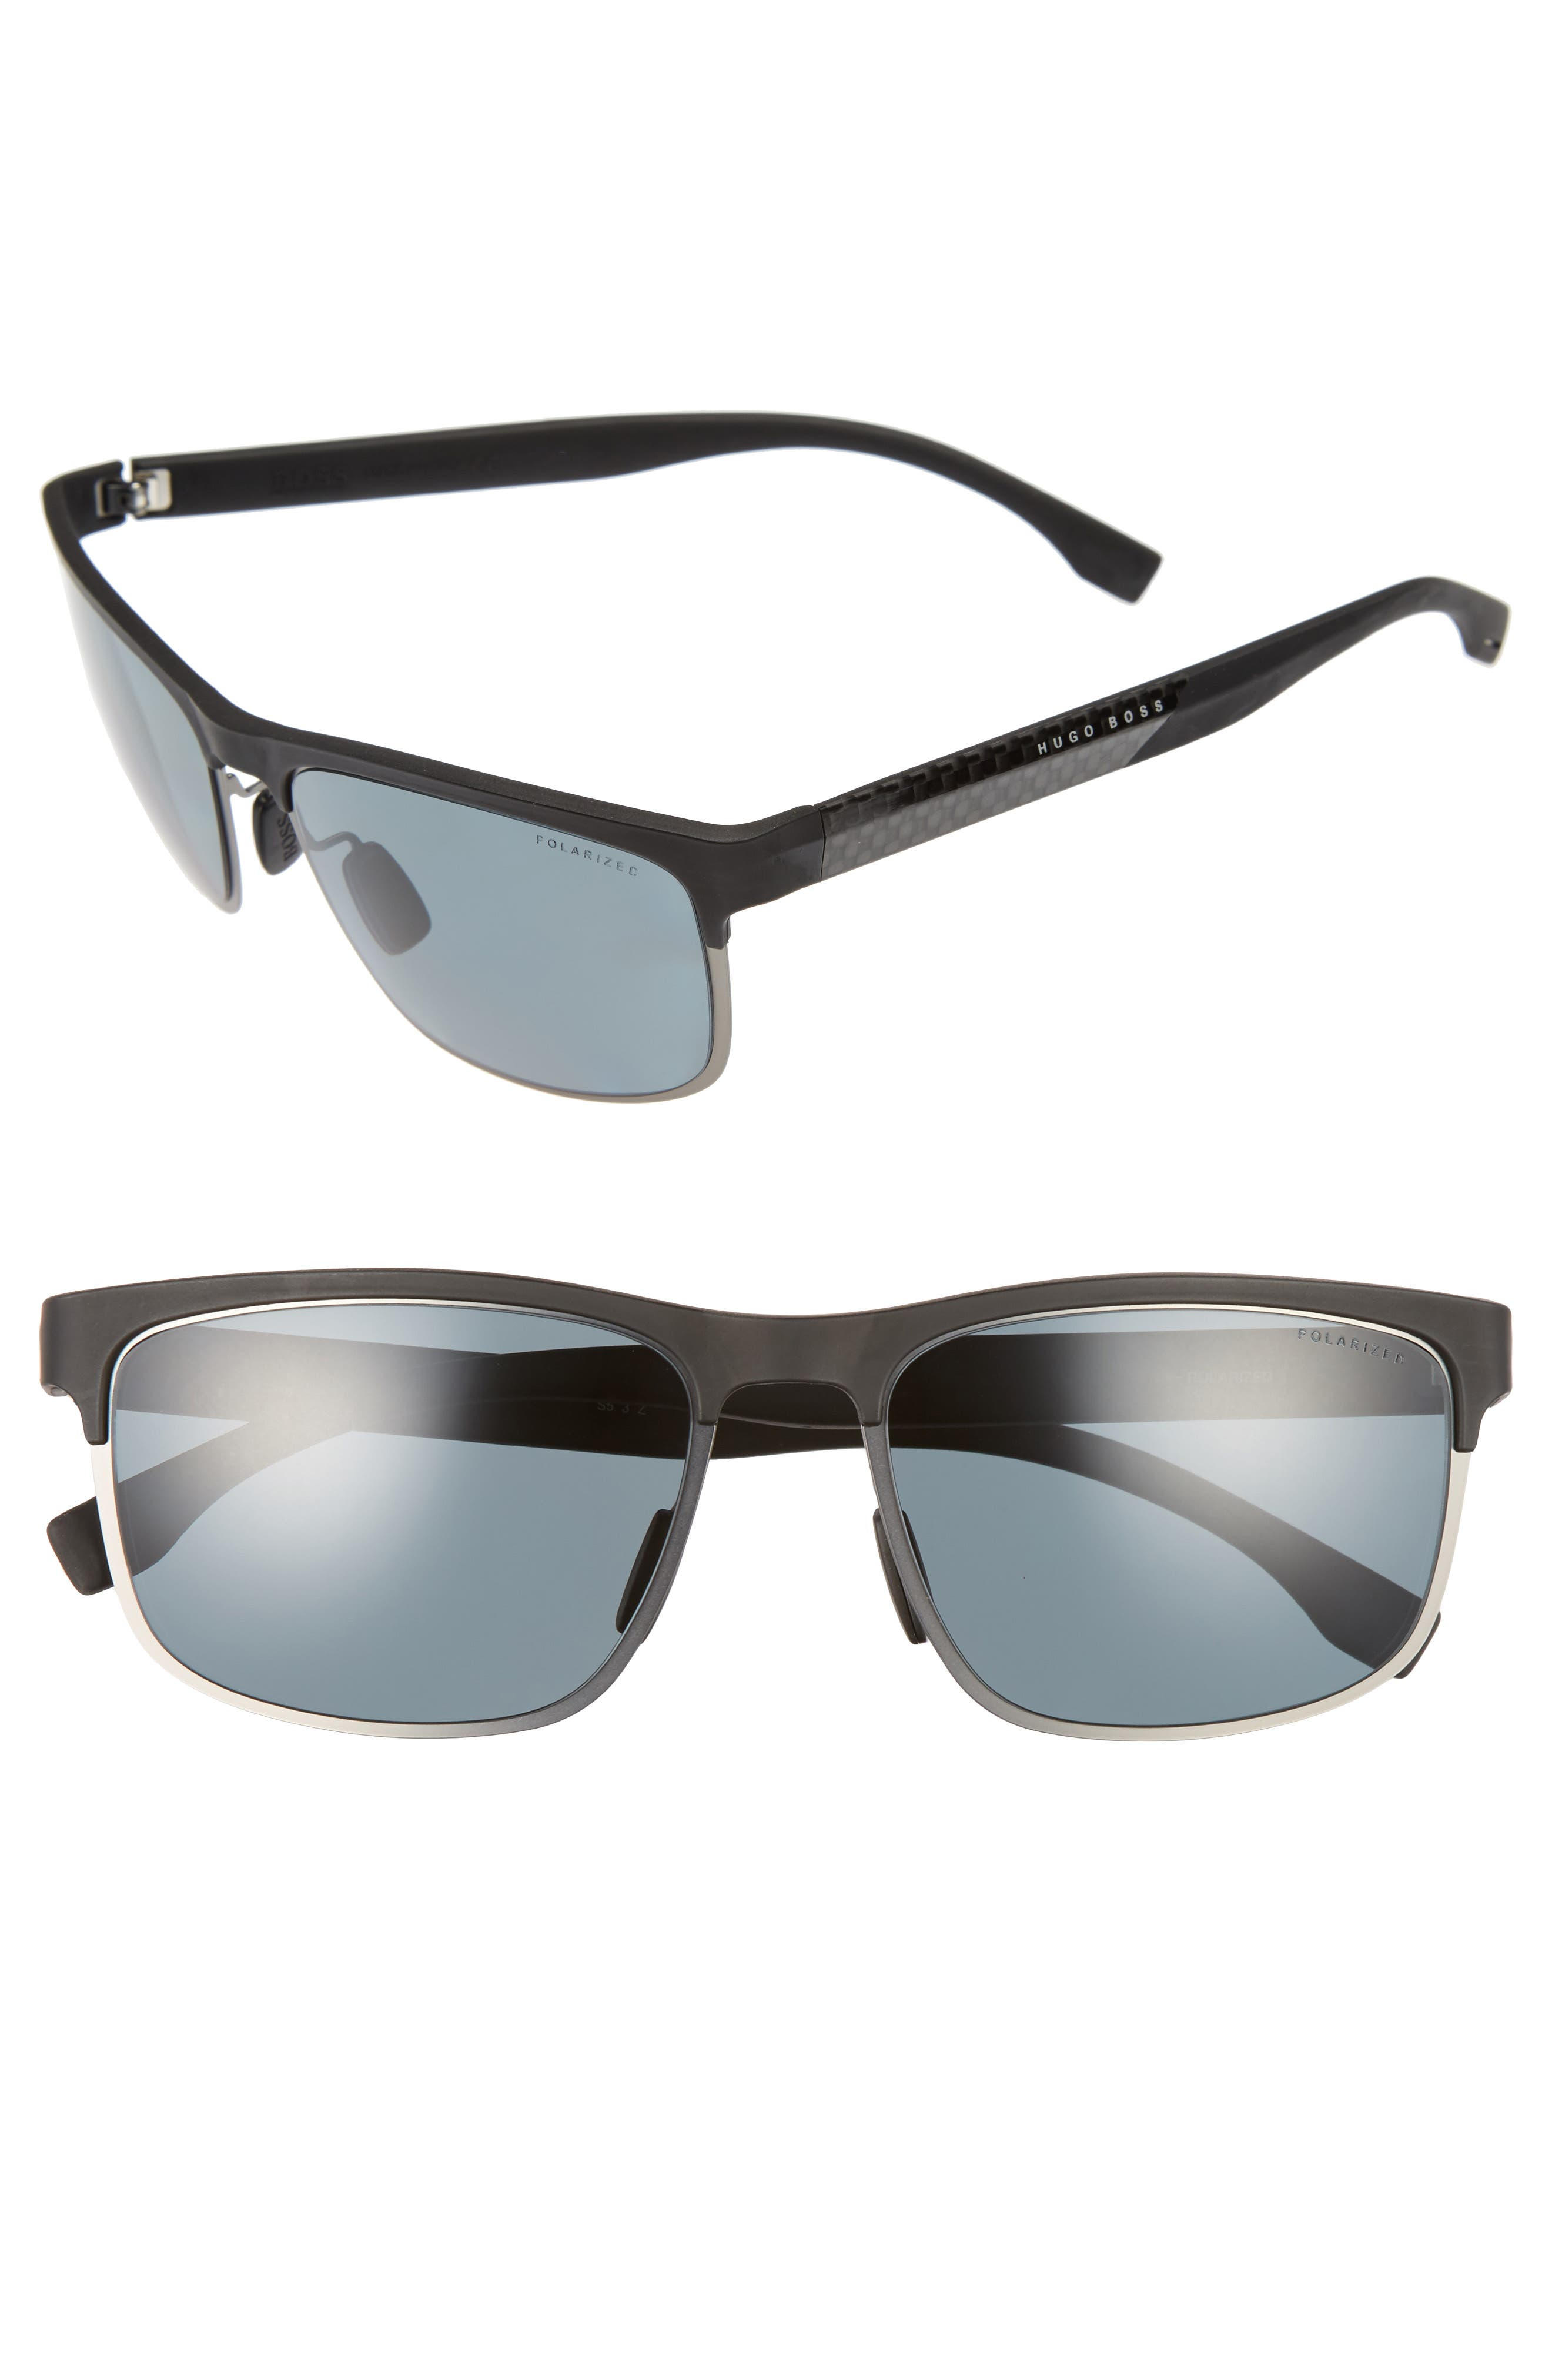 58mm Polarized Sunglasses,                             Alternate thumbnail 2, color,                             001